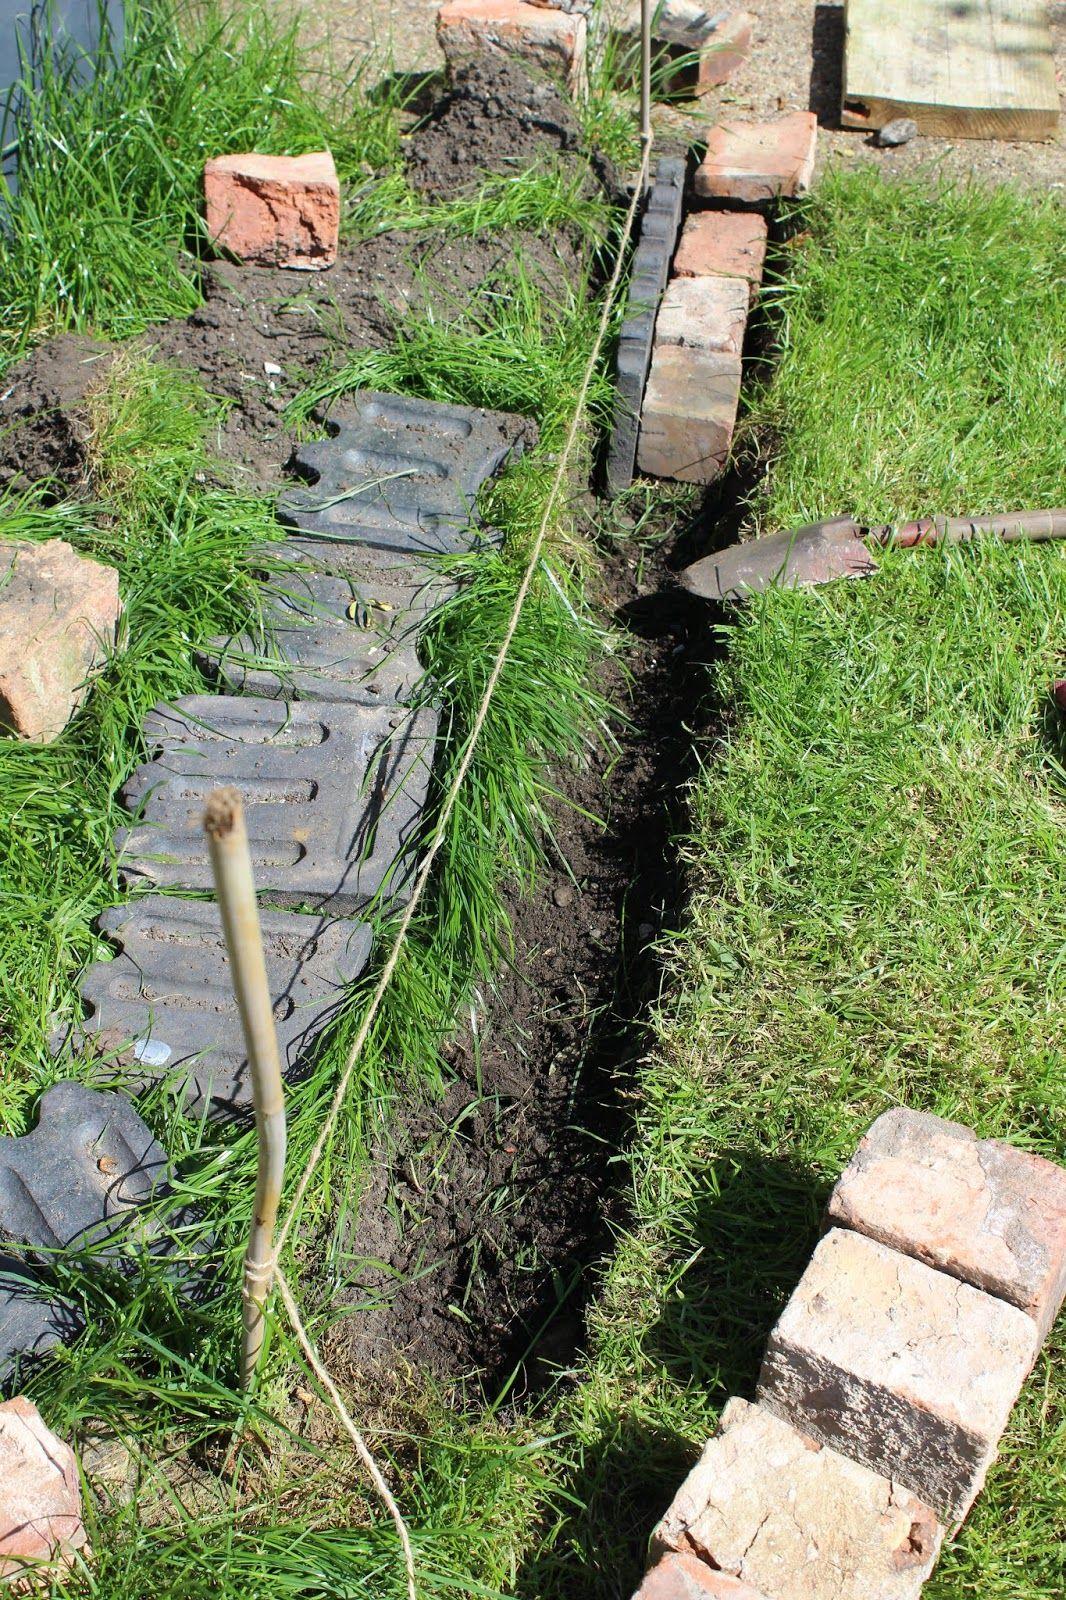 Laying Gravel In the Garden | Gravel patio diy, Backyard ...